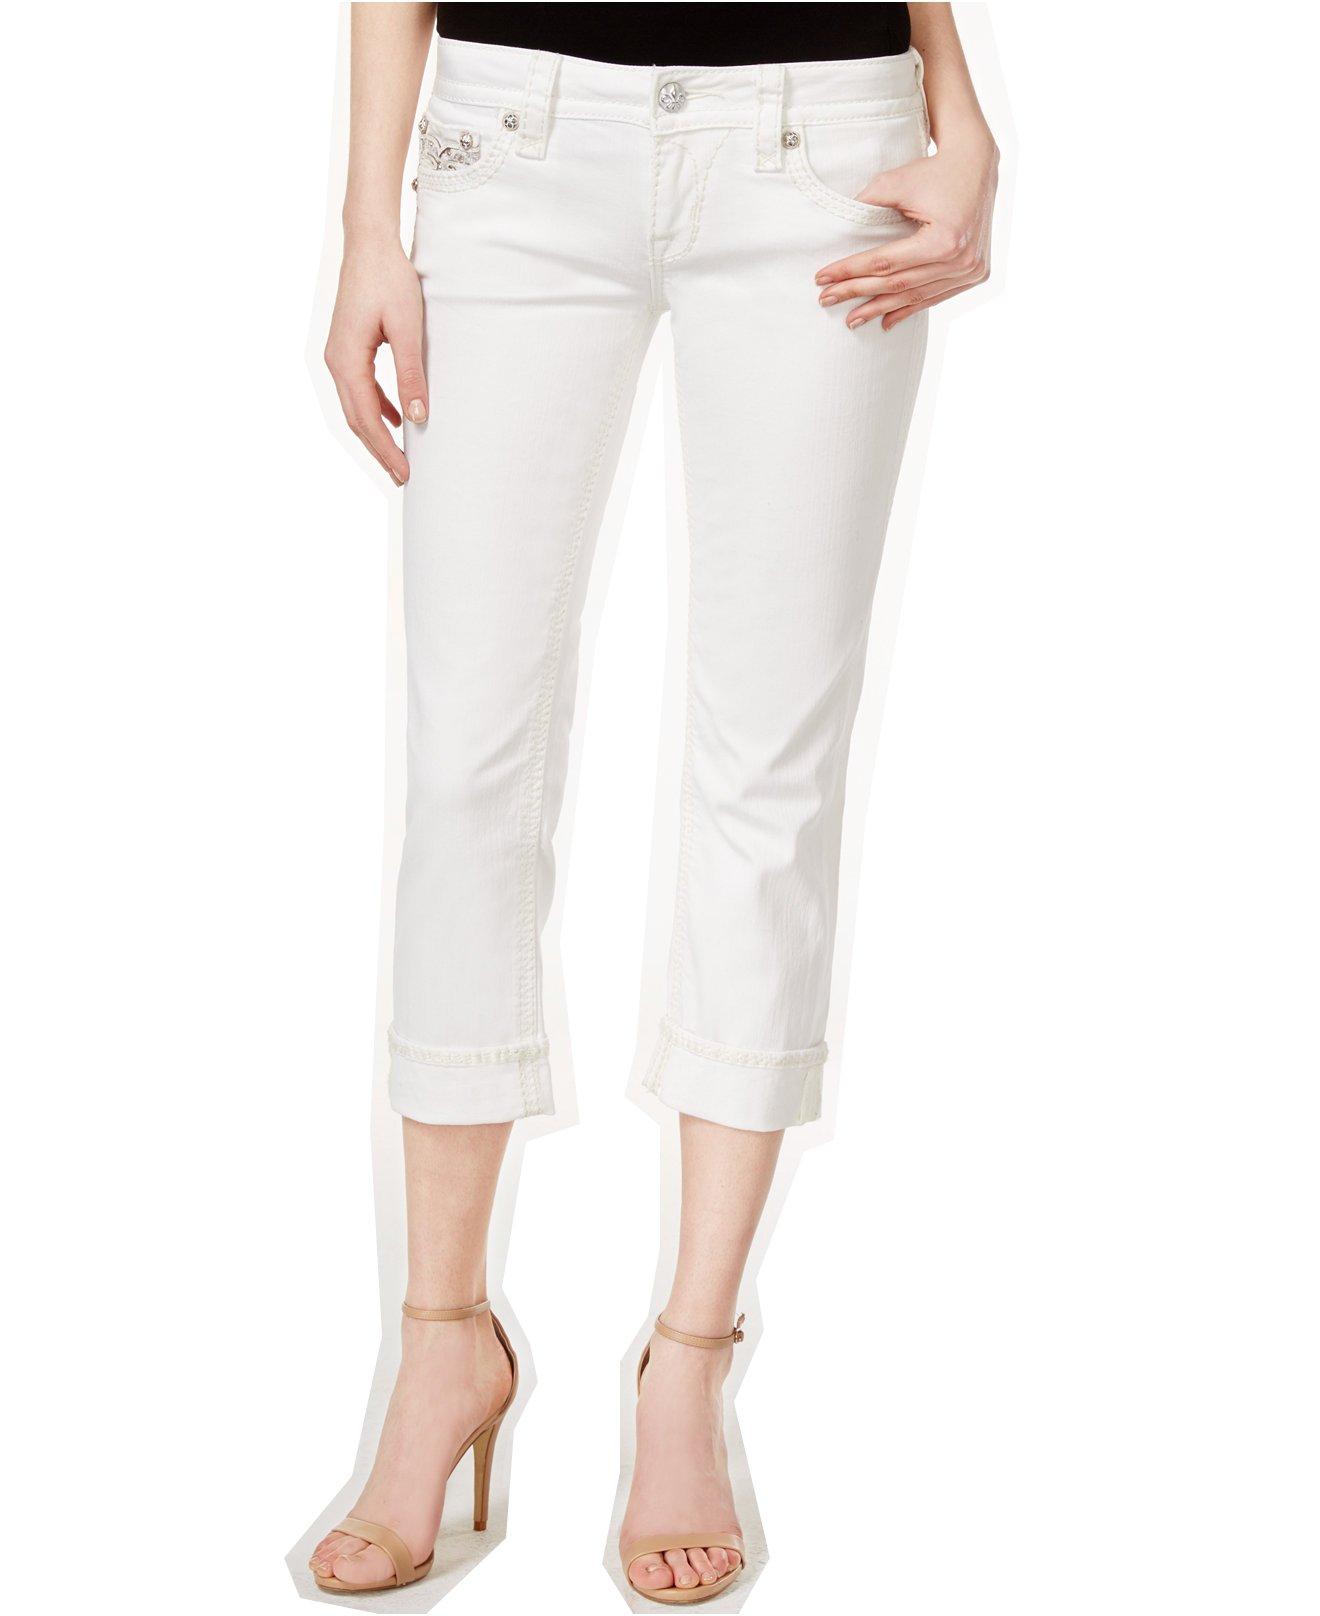 Rock Revival Women's Katie Cropped Embellished Capri Jeans (29 x 22L, White) by Rock Revival